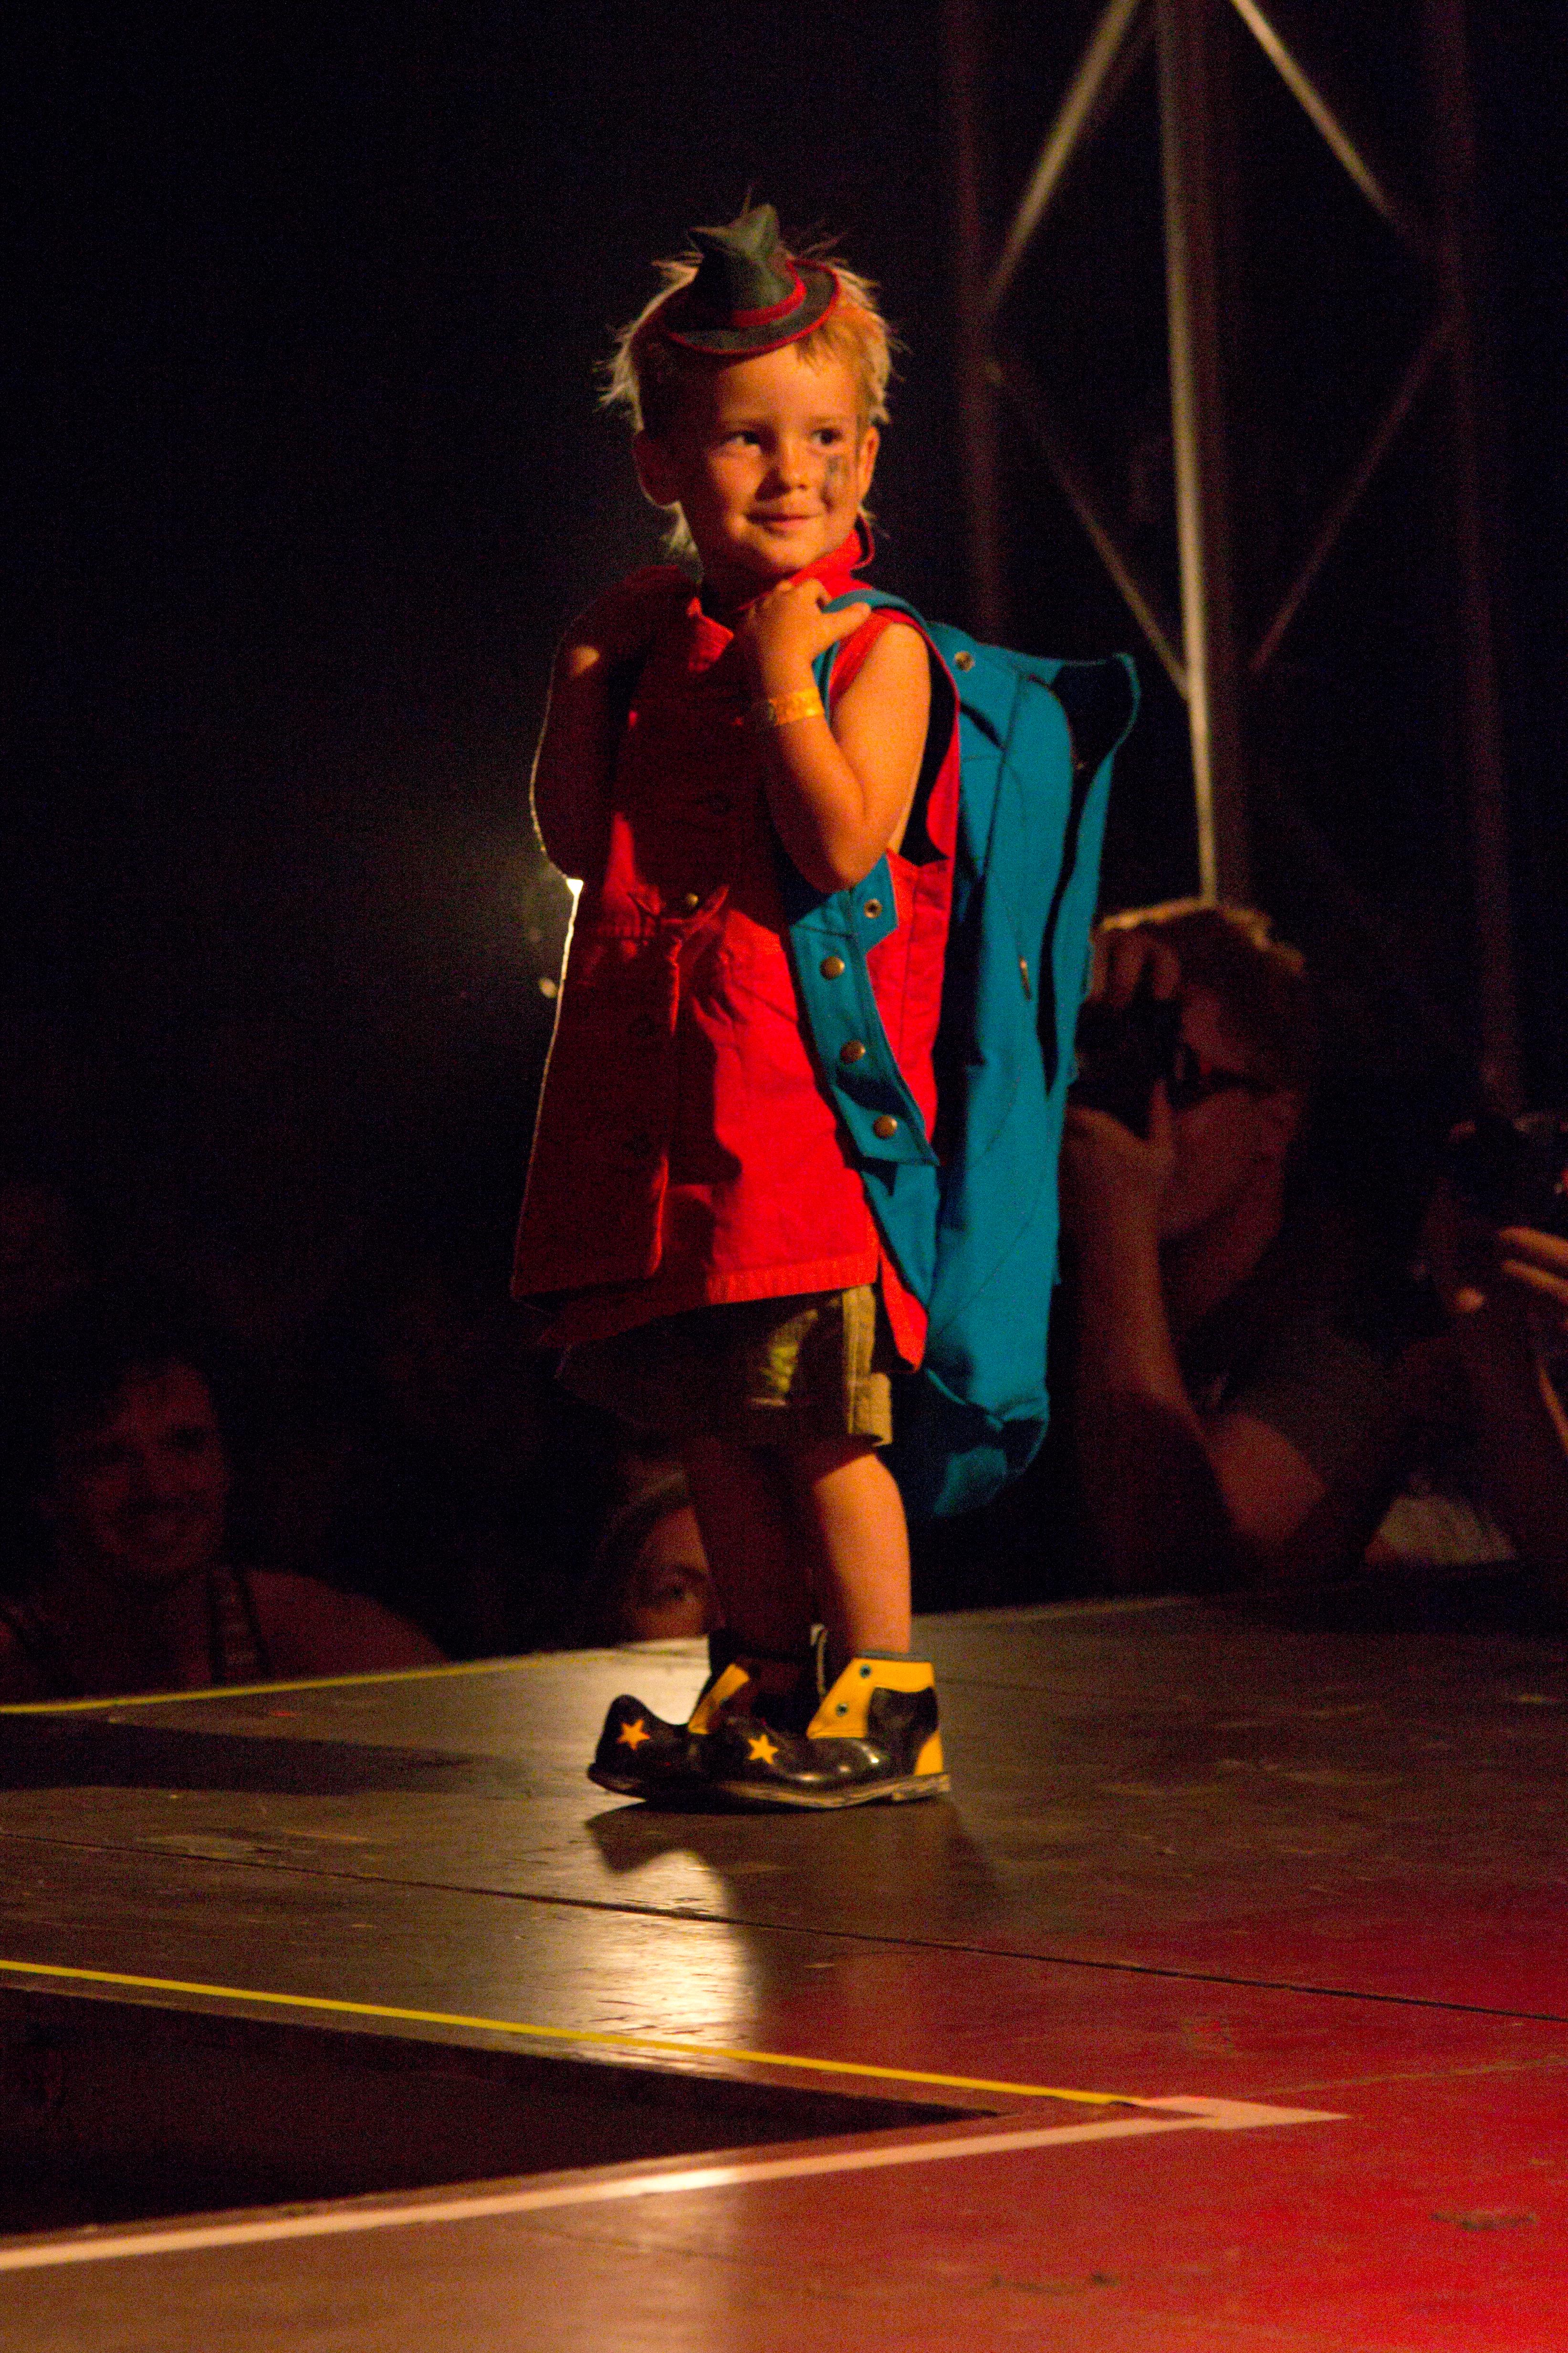 EJC 2012 day 5: House of Intrika Fashion Show.